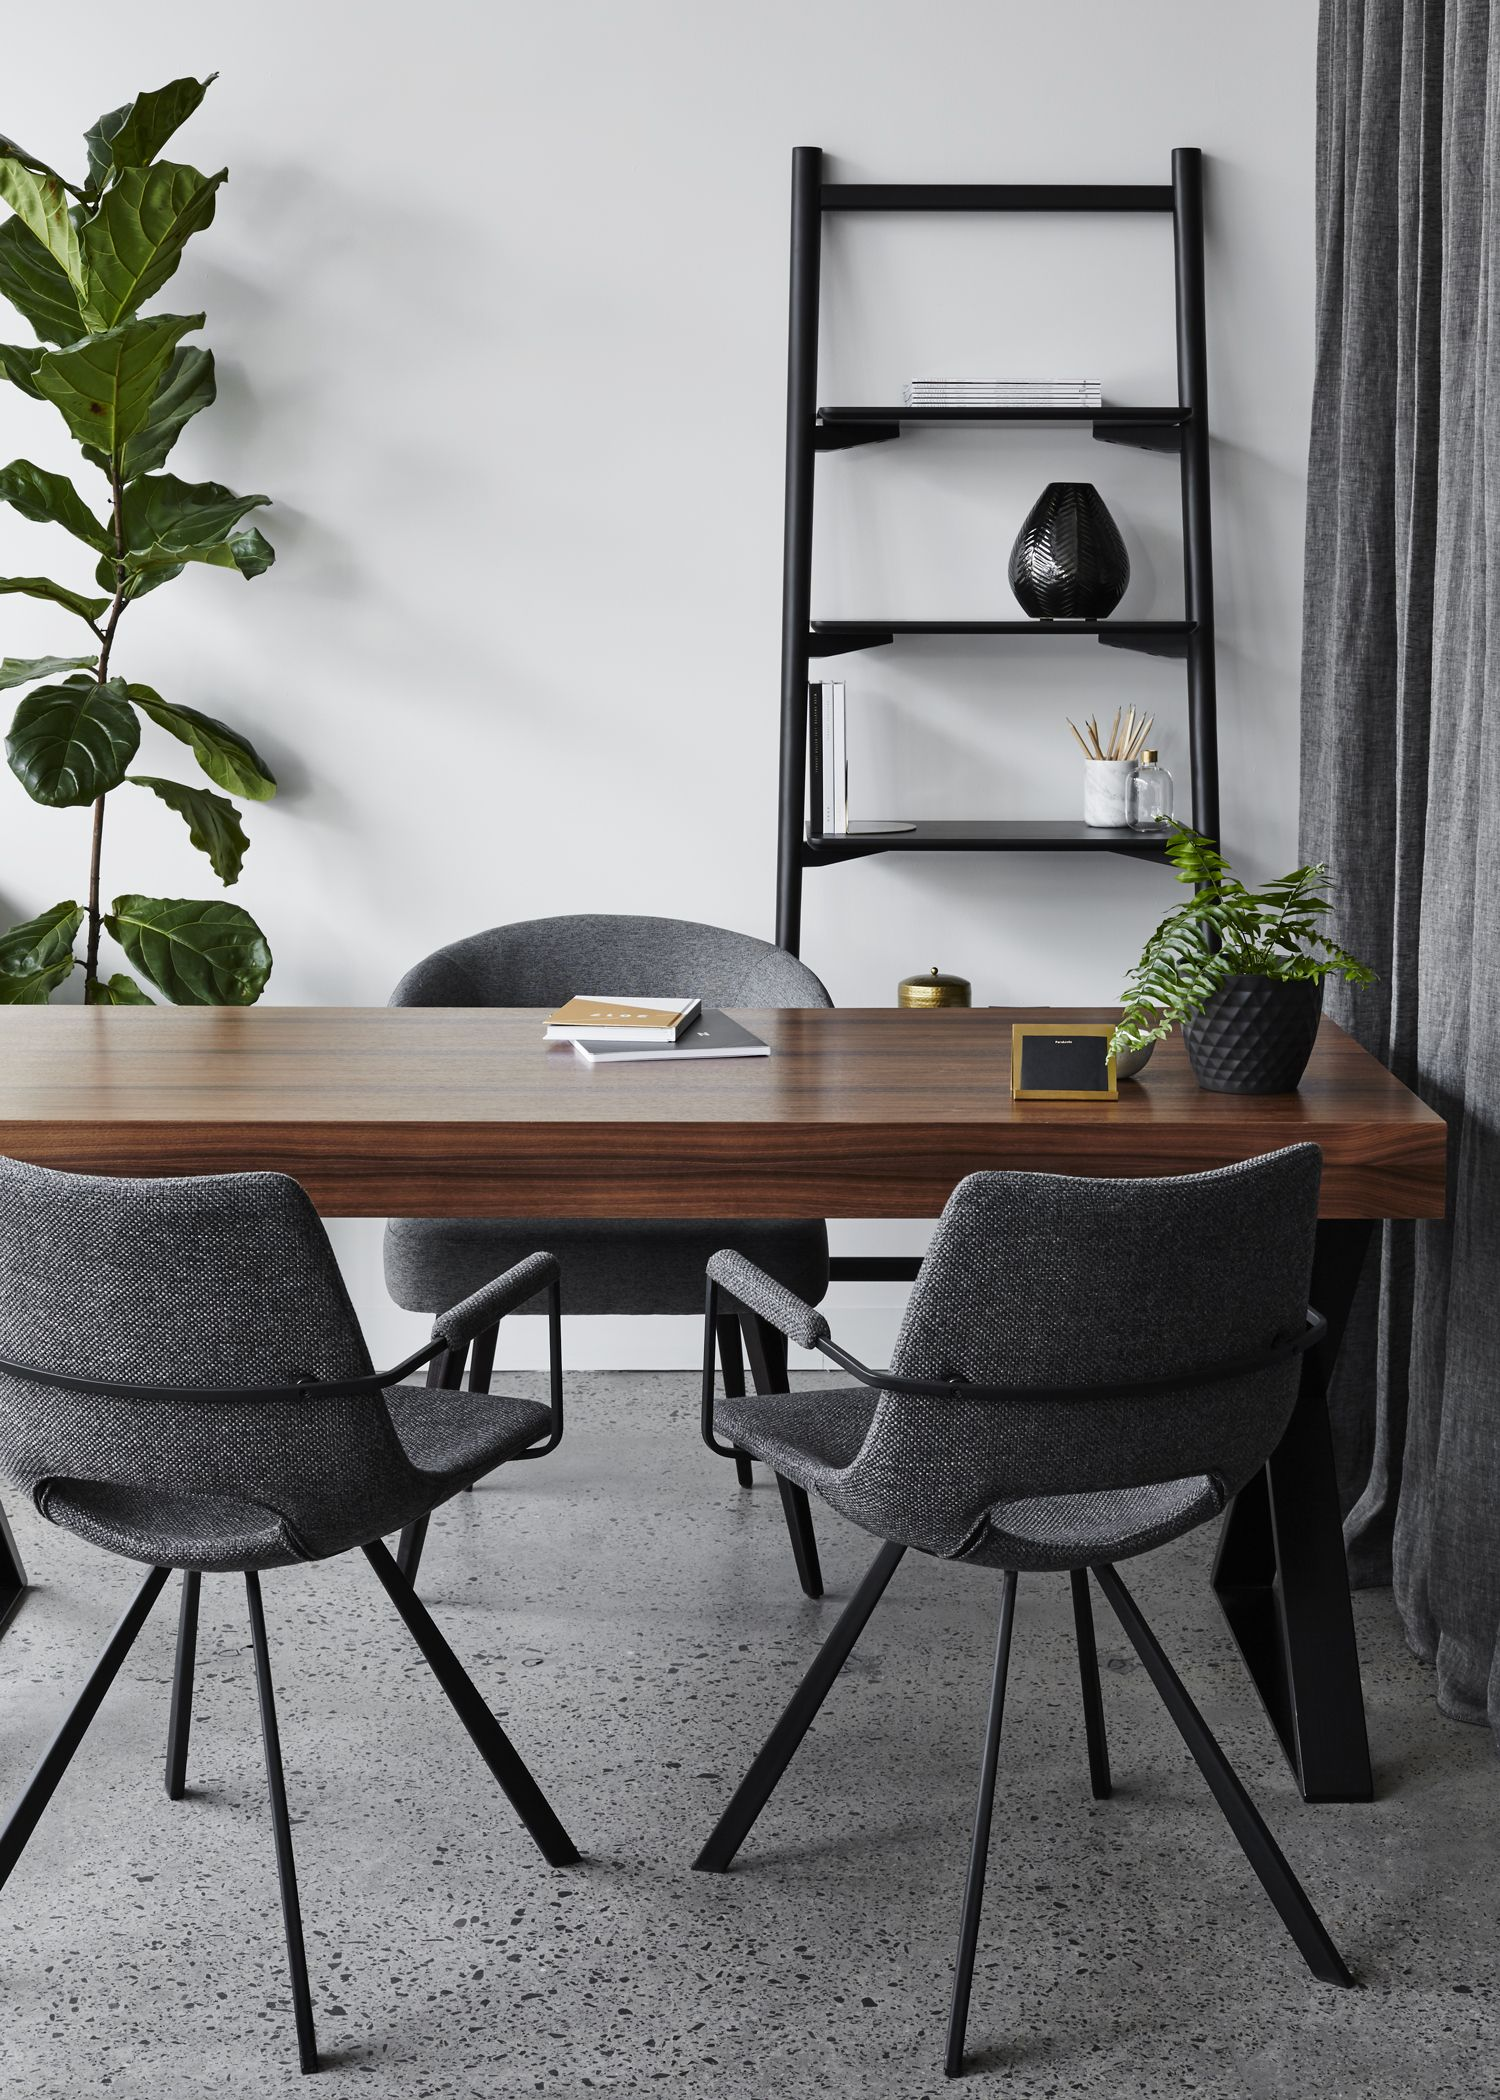 Most wanted interiors mostwantedinteriors on pinterest